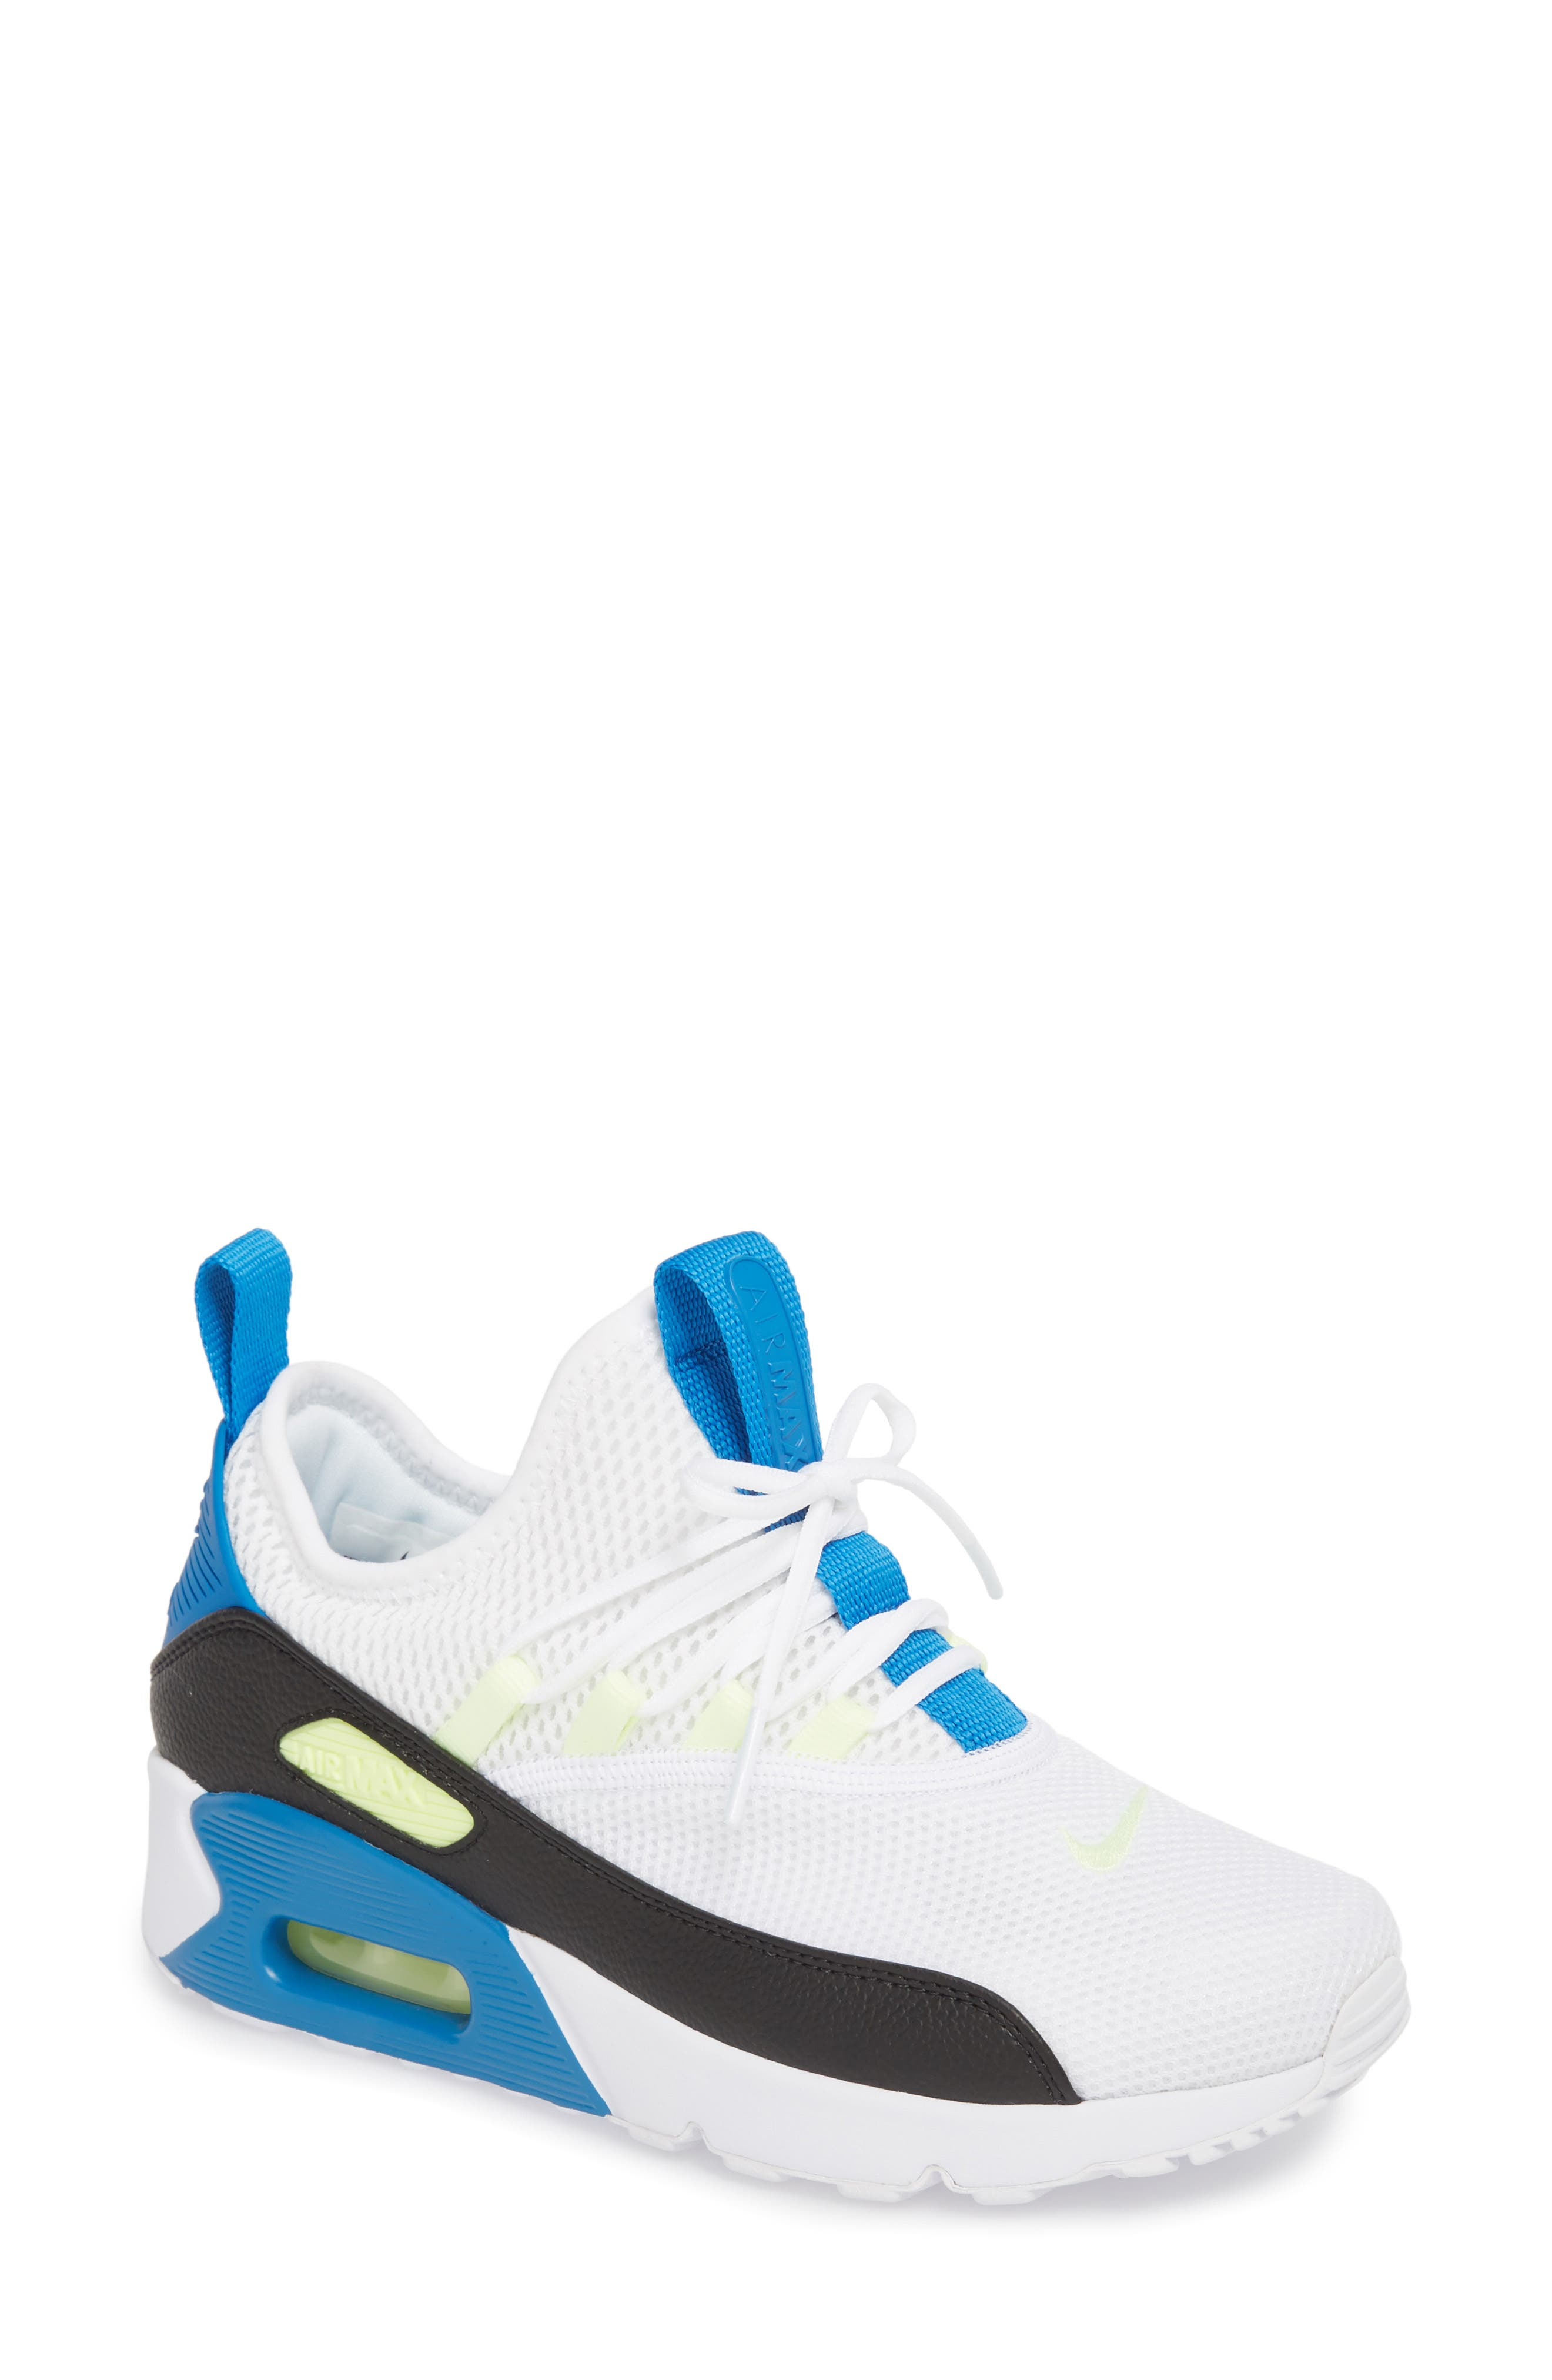 Air Max 90 EZ Sneaker,                             Main thumbnail 1, color,                             102